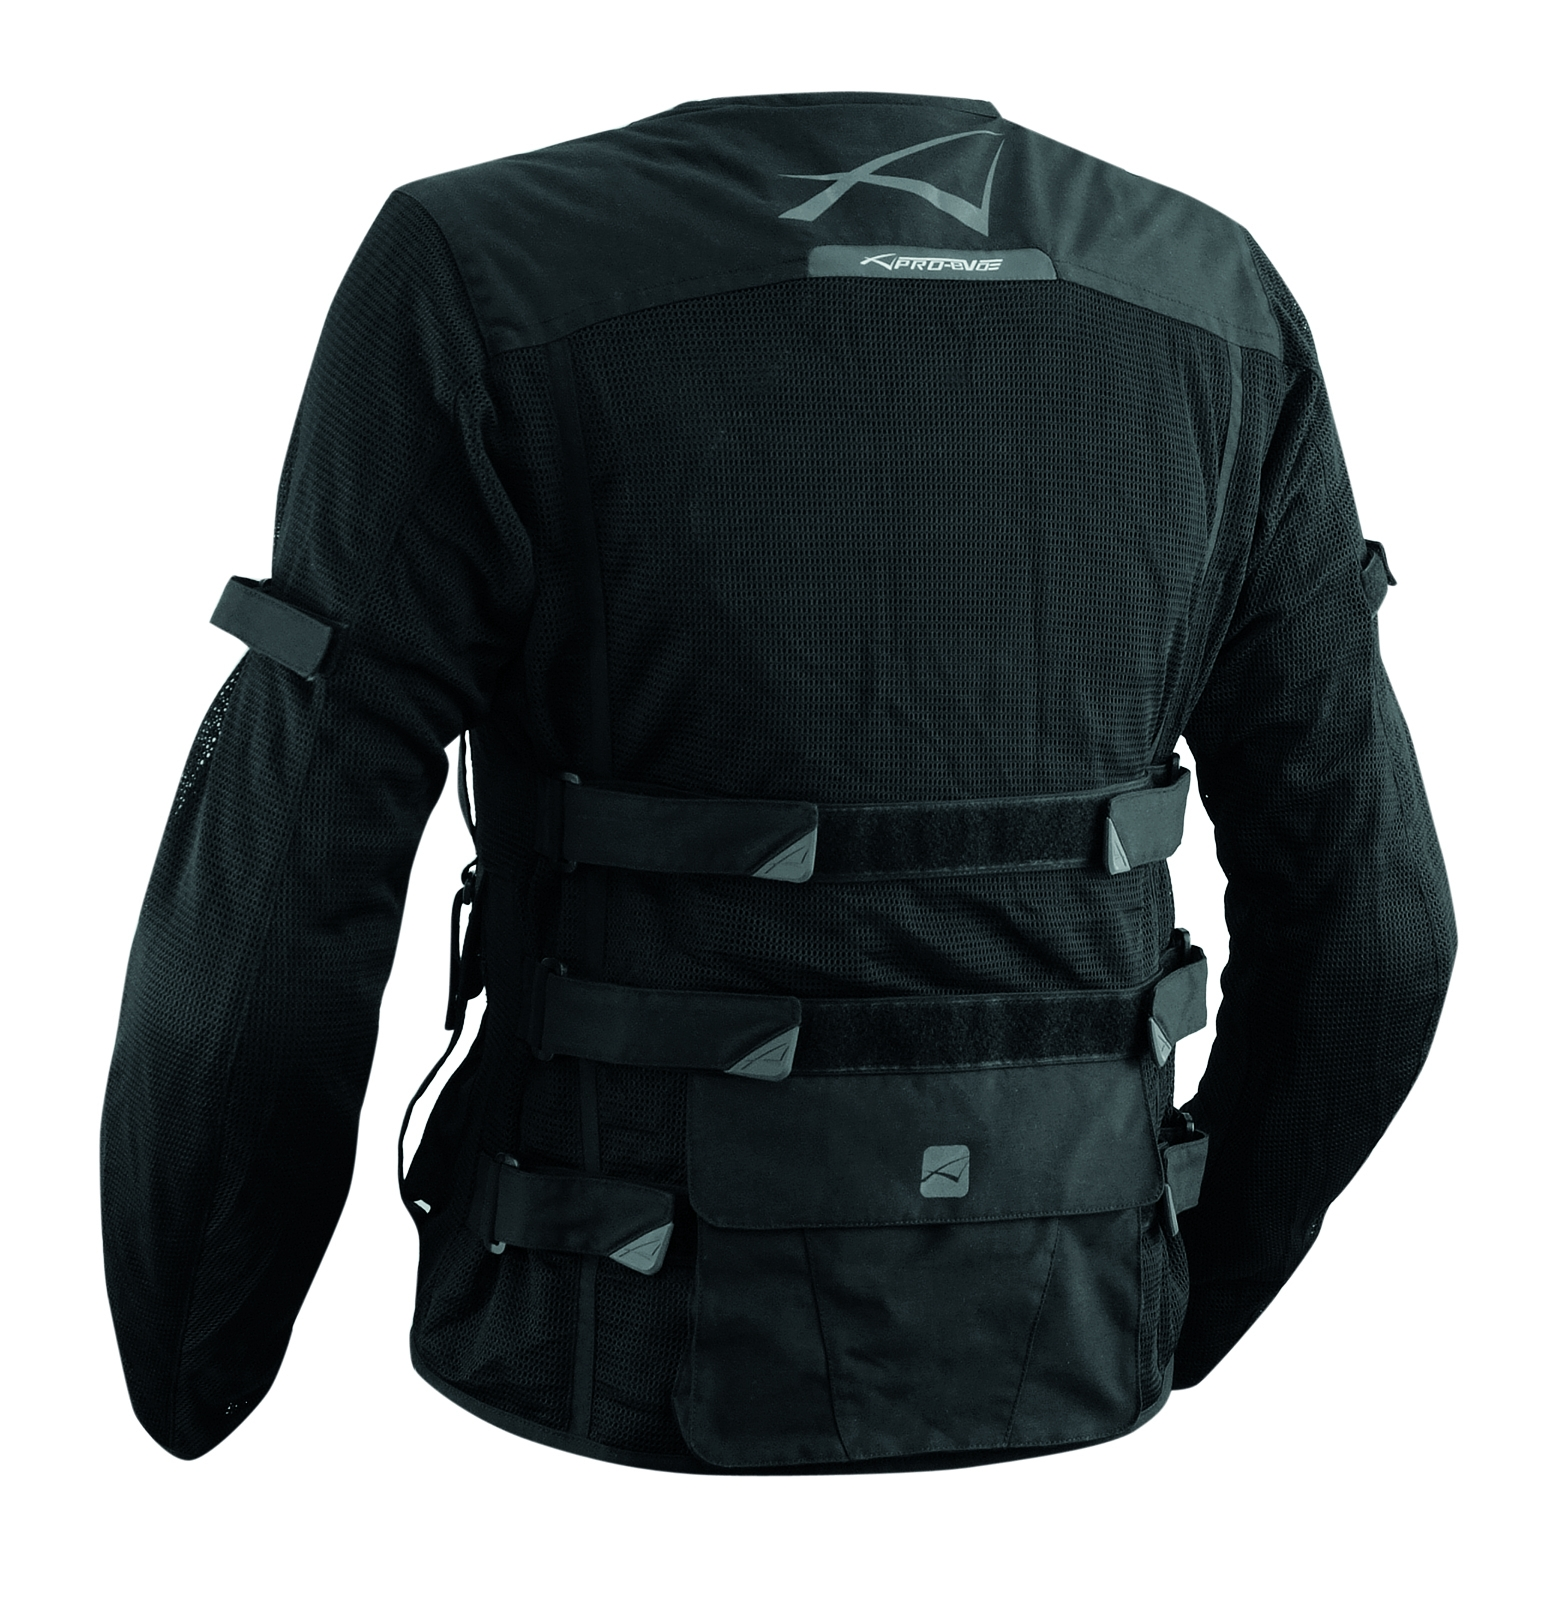 Chaqueta-Moto-Verano-Protecciones-Homologado-Ce-Tejido-Red-Malla-Respirable Indexbild 3